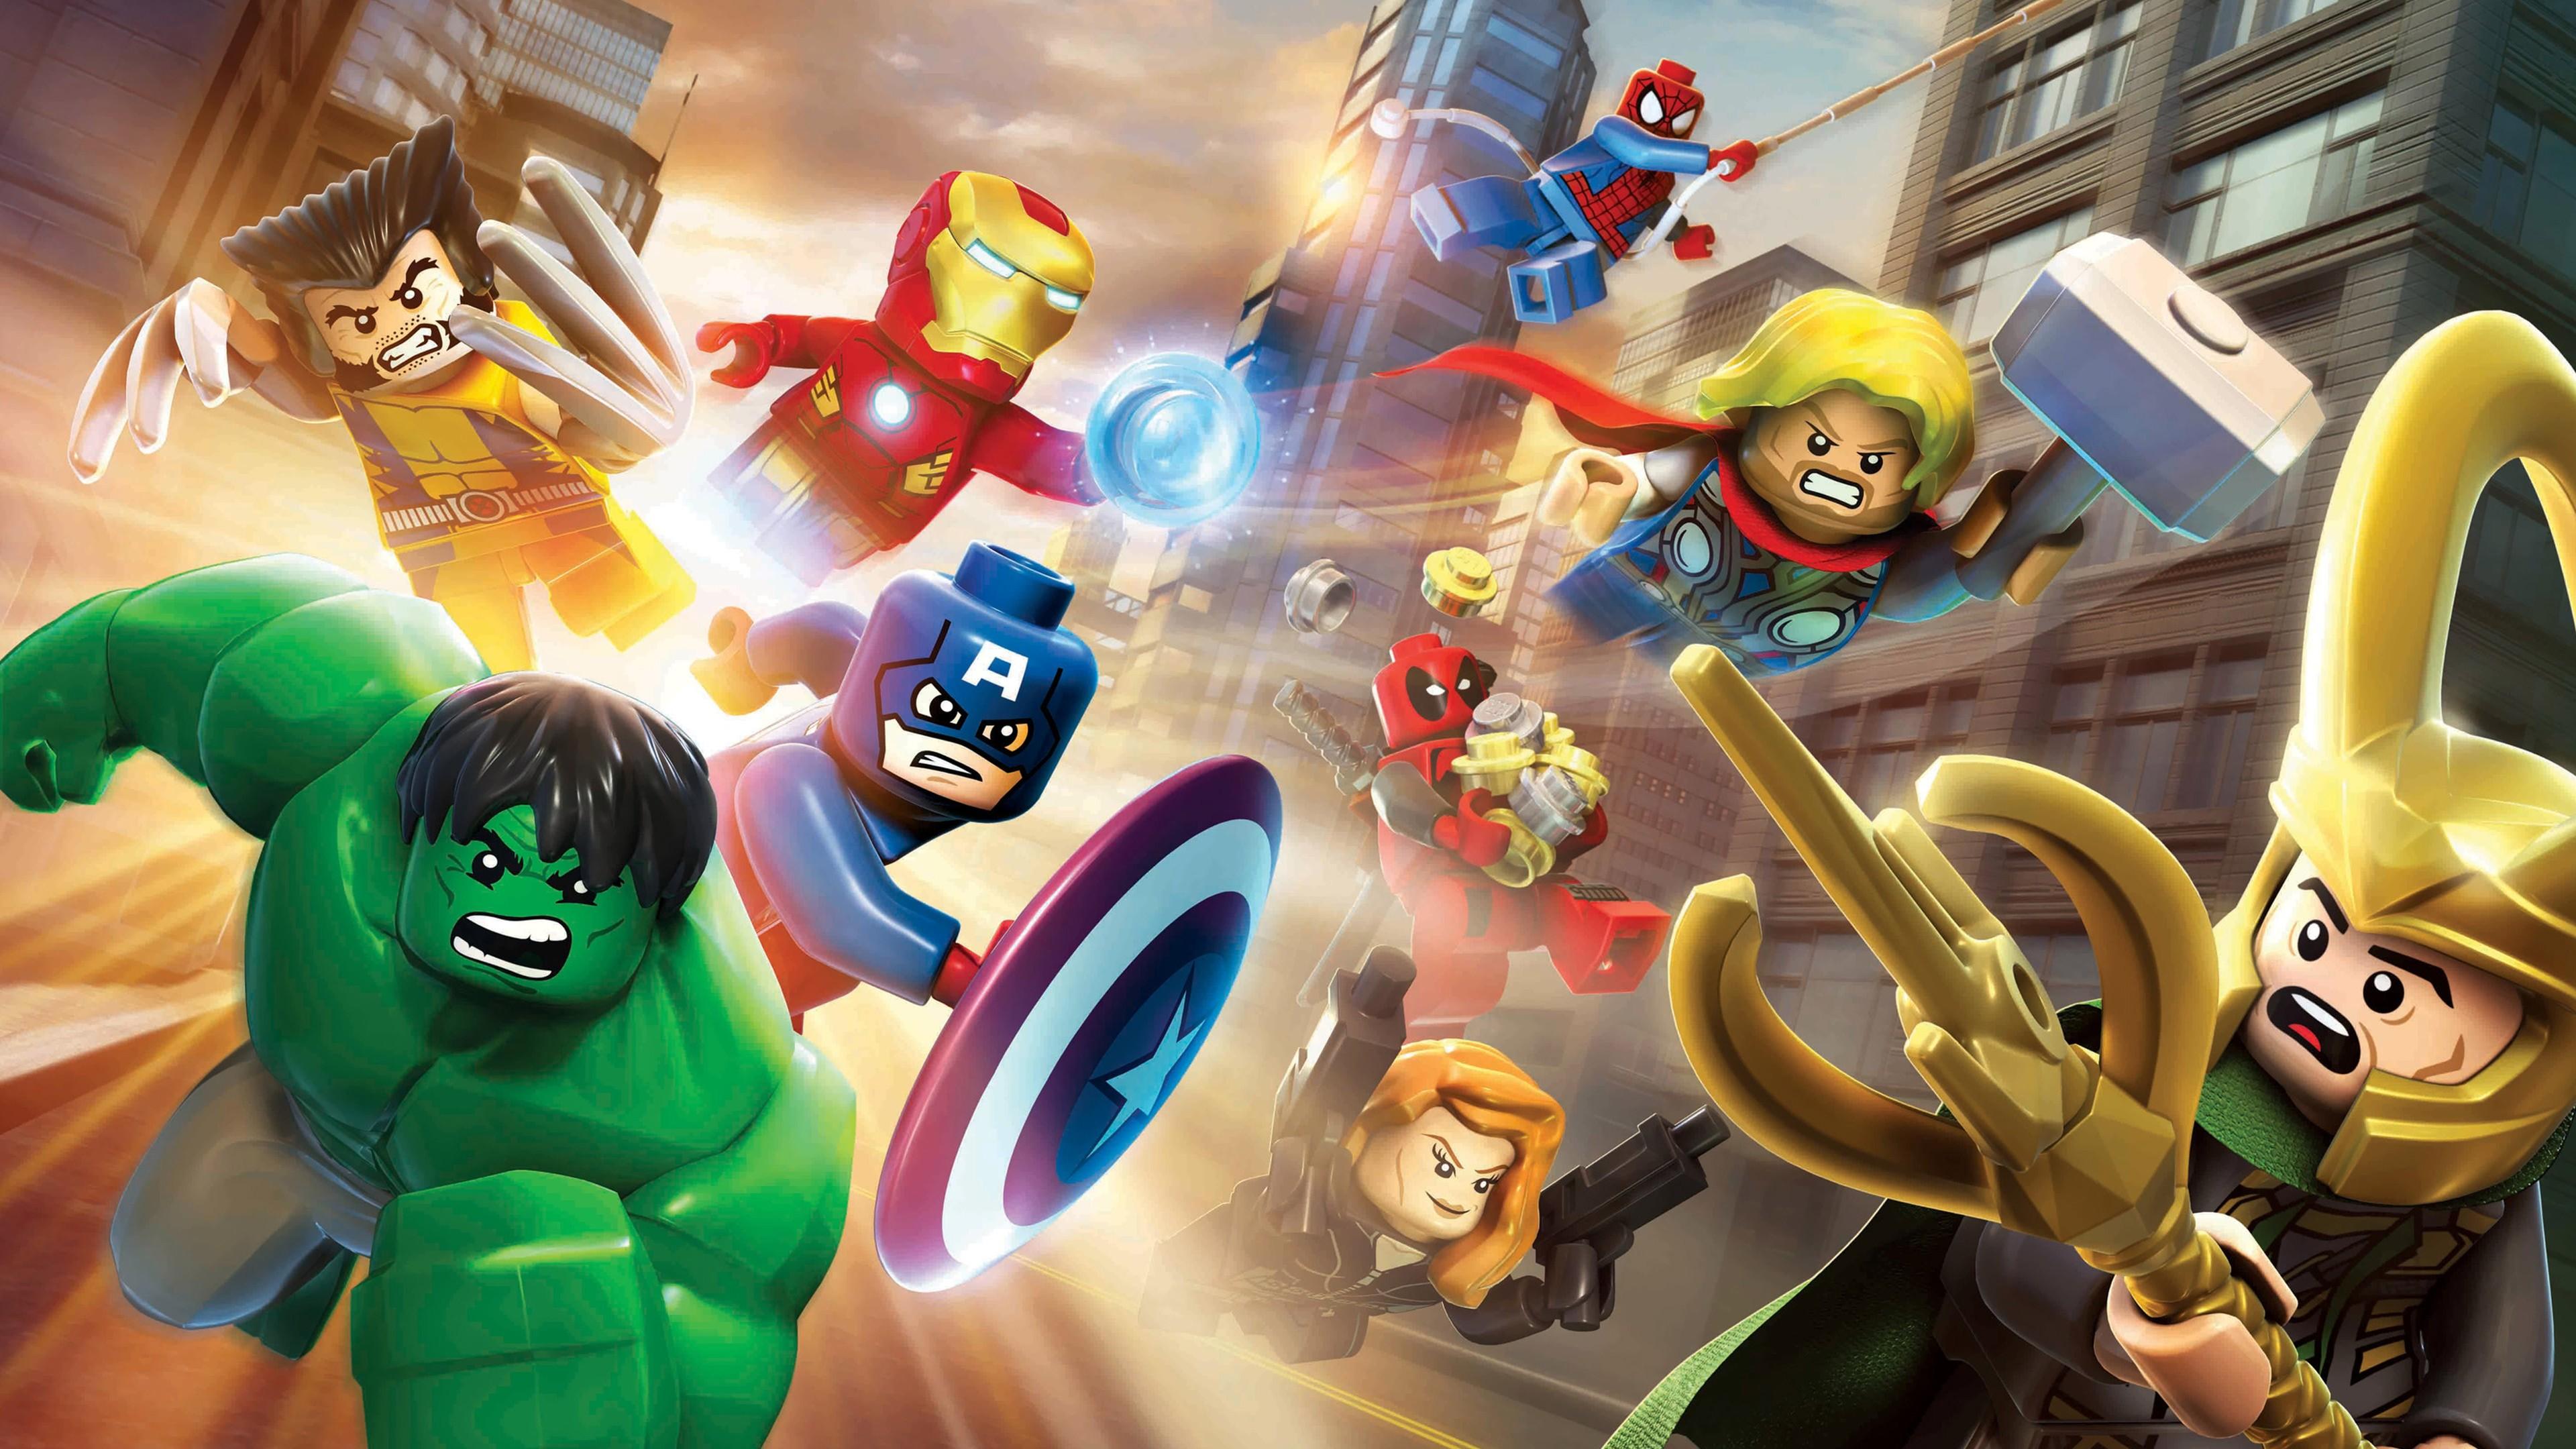 marvel lego superheroes 1536522575 - Marvel Lego Superheroes - thor wallpapers, superheroes wallpapers, marvel wallpapers, loki wallpapers, lego wallpapers, iron man wallpapers, hulk wallpapers, hd-wallpapers, captain america wallpapers, 5k wallpapers, 4k-wallpapers